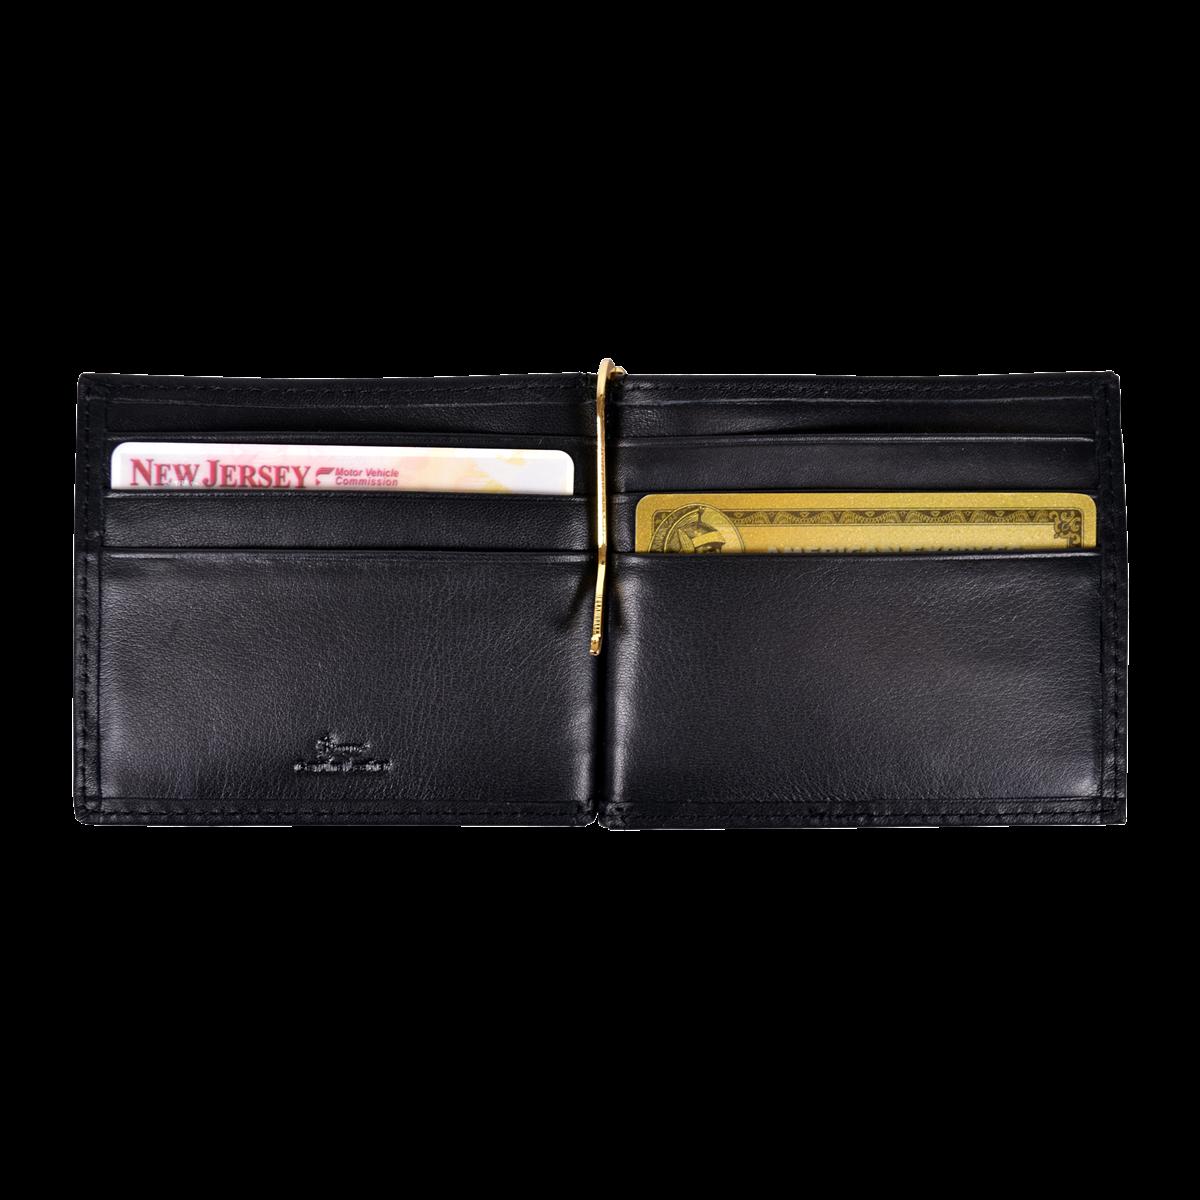 clip black and white RFID Blocking Money Clip Wallet